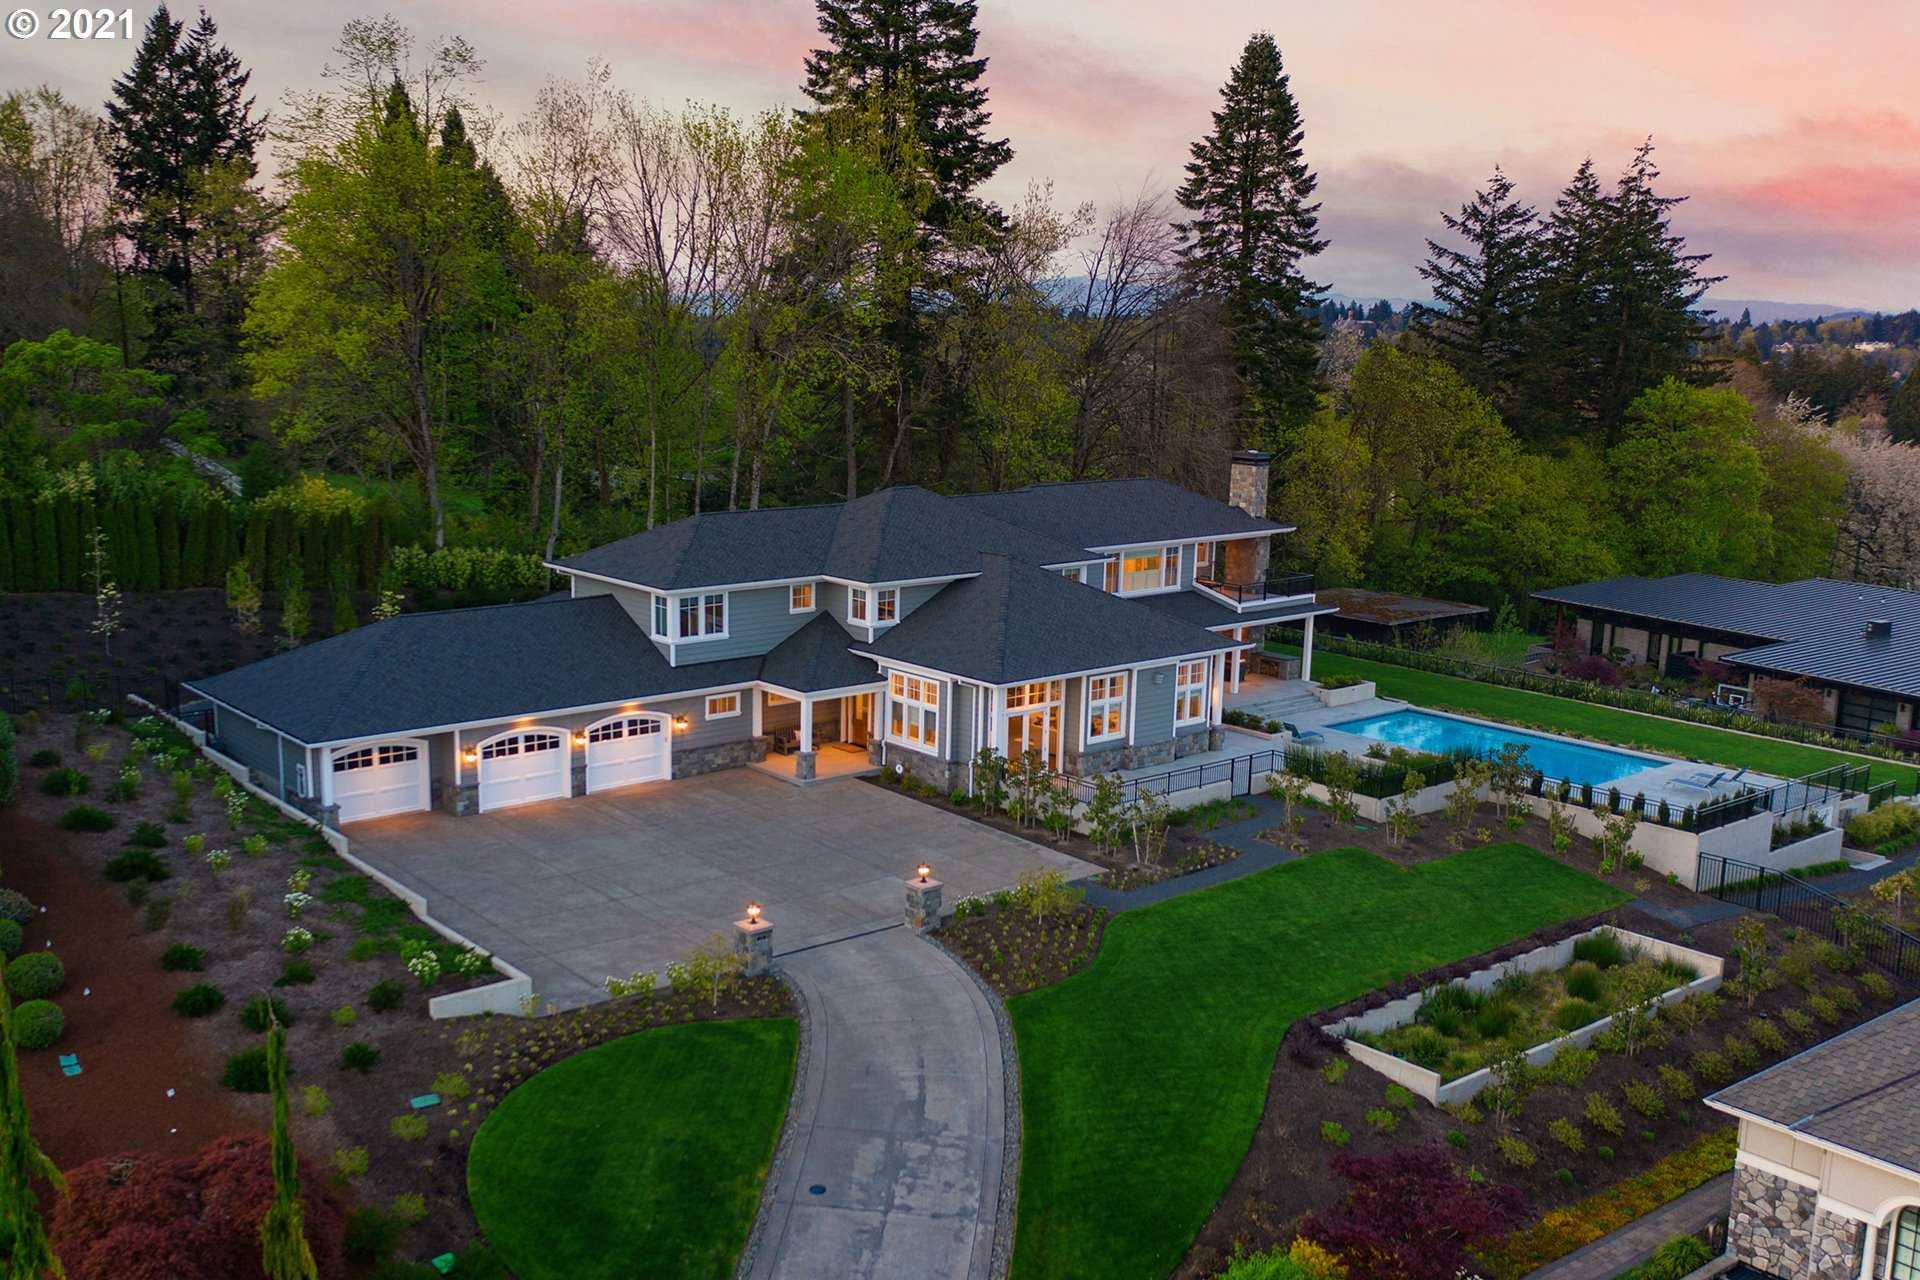 $5,499,000 - 5Br/7Ba -  for Sale in Lake Oswego